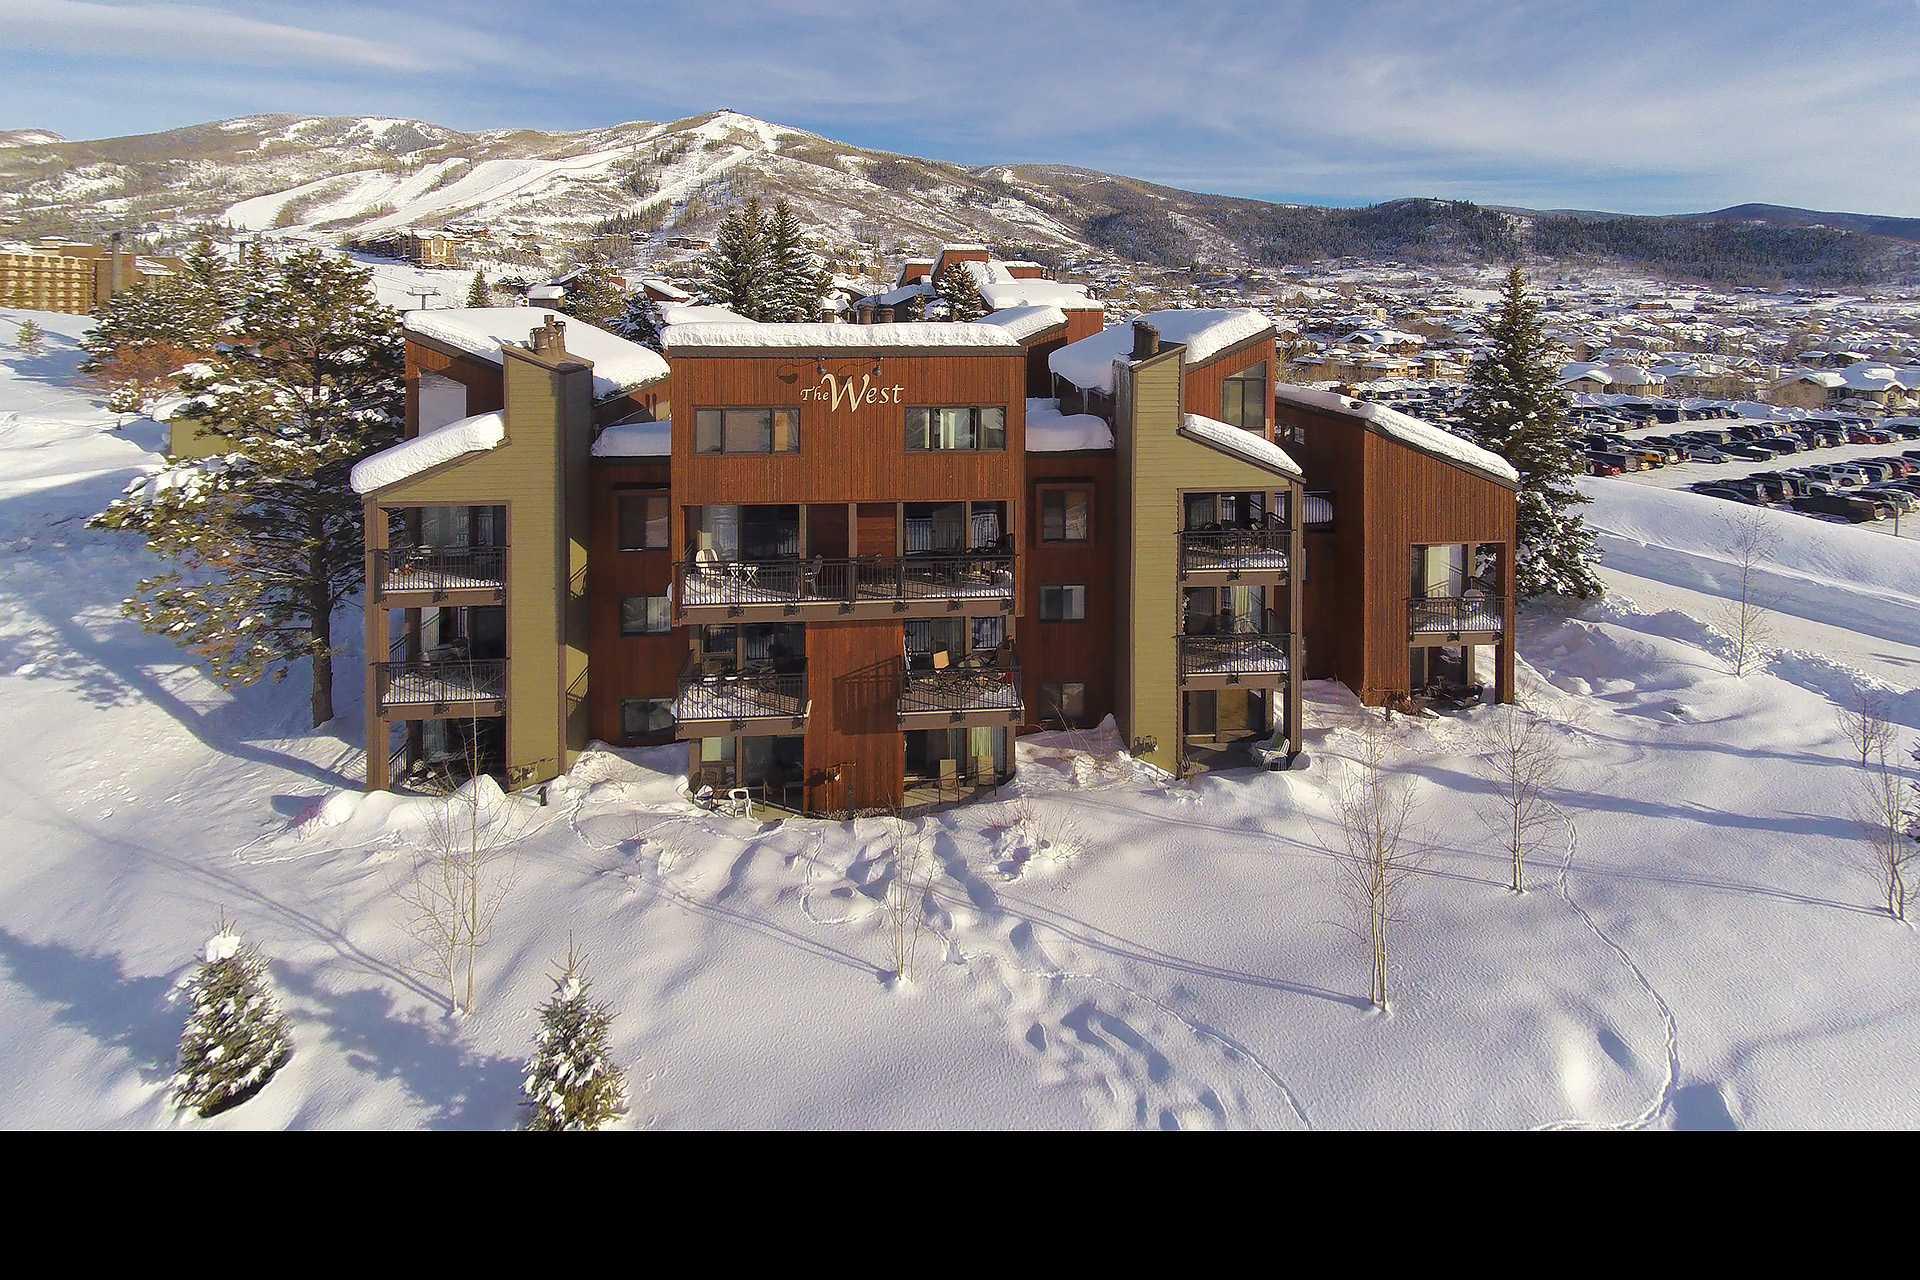 W3234: The West Condominiums